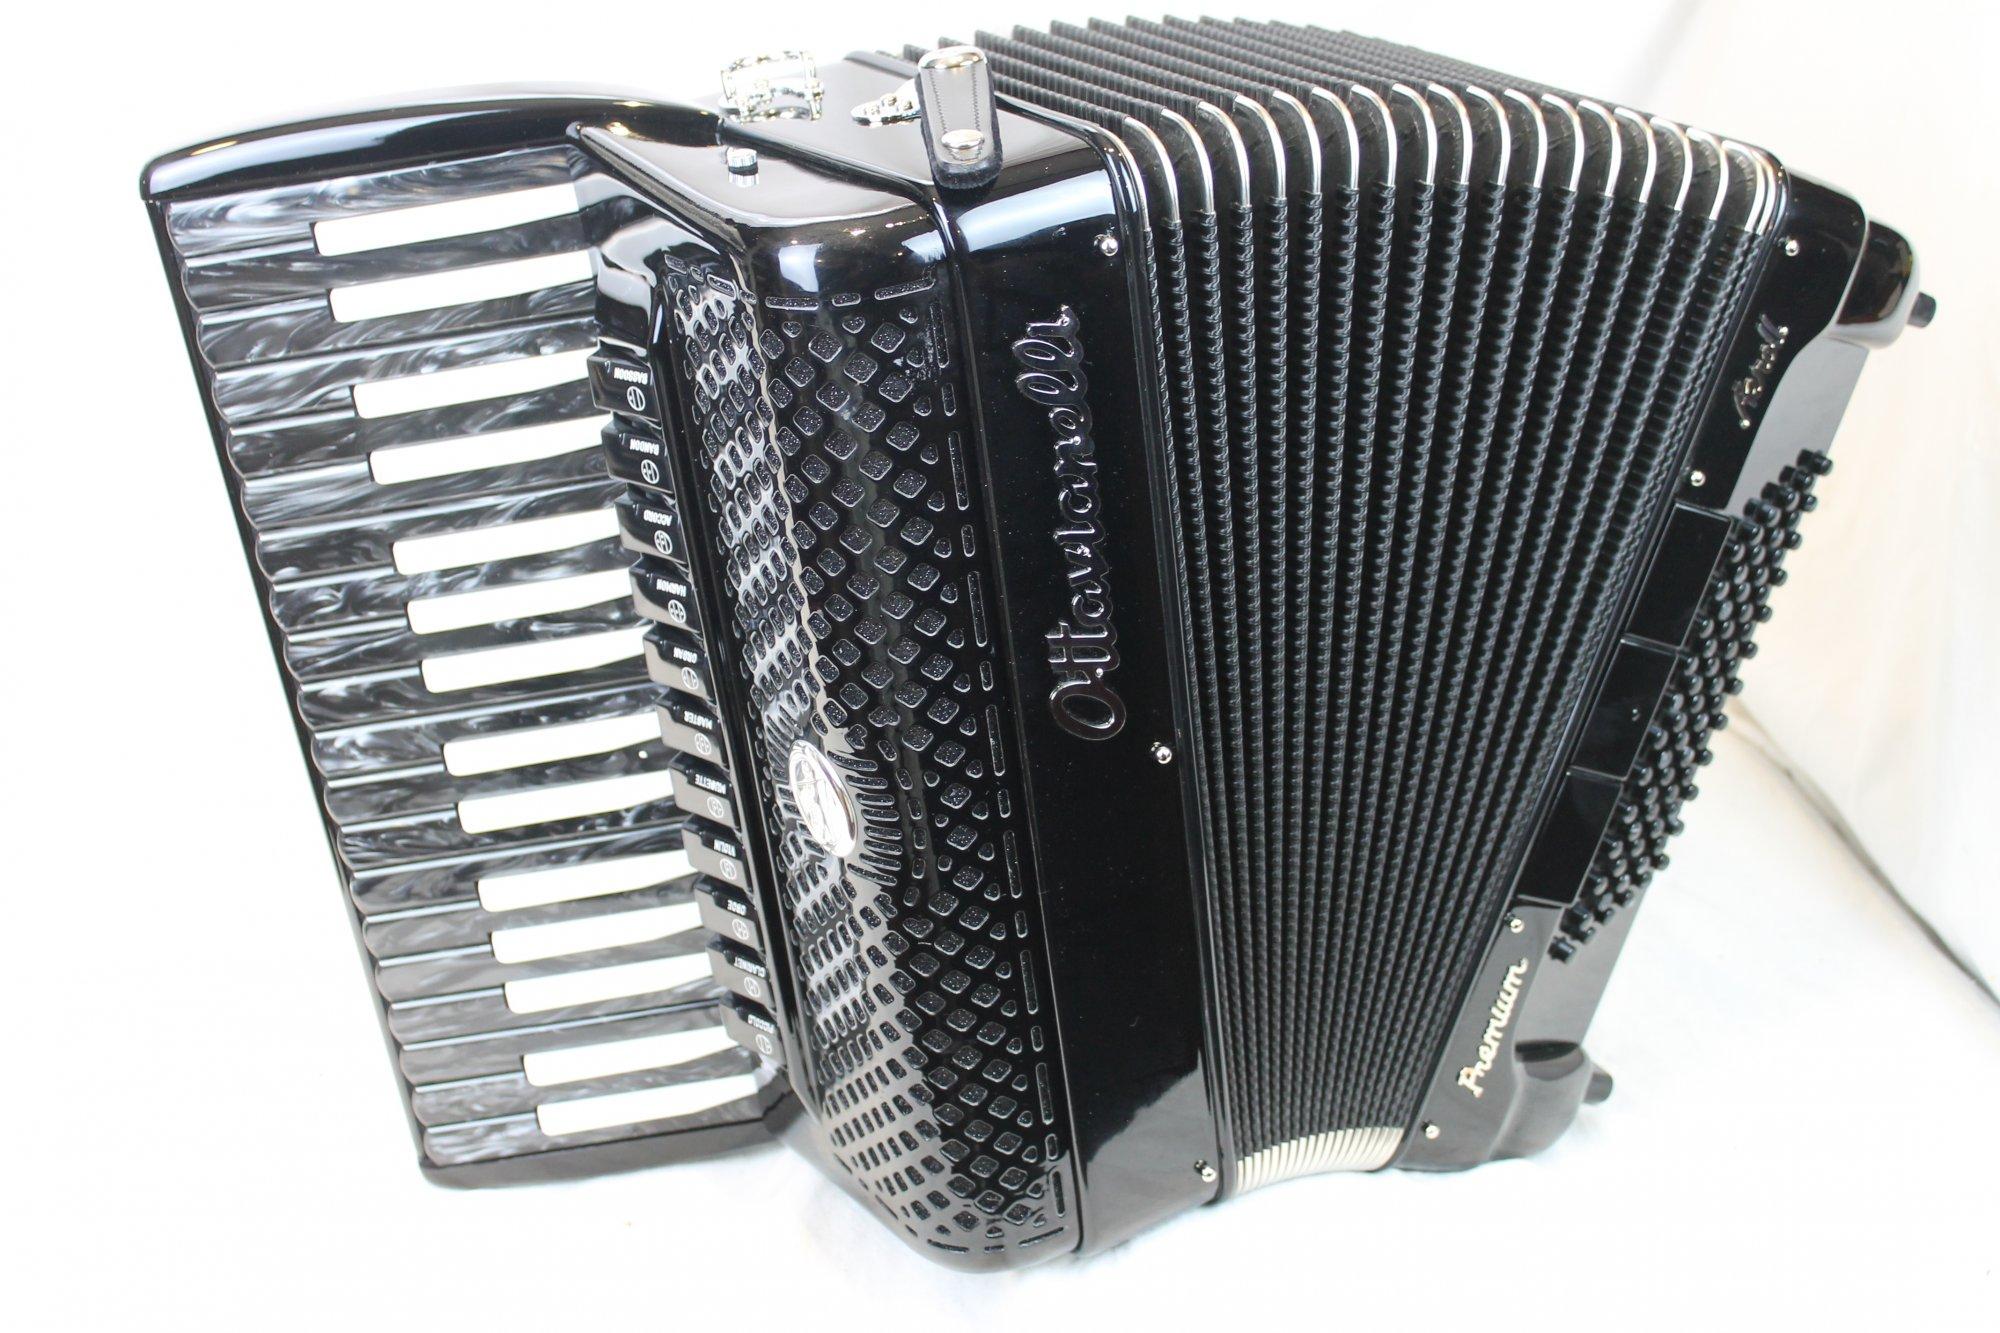 NEW Black Inverted Ottavianelli Aero II Piano Accordion LMMH 34 72